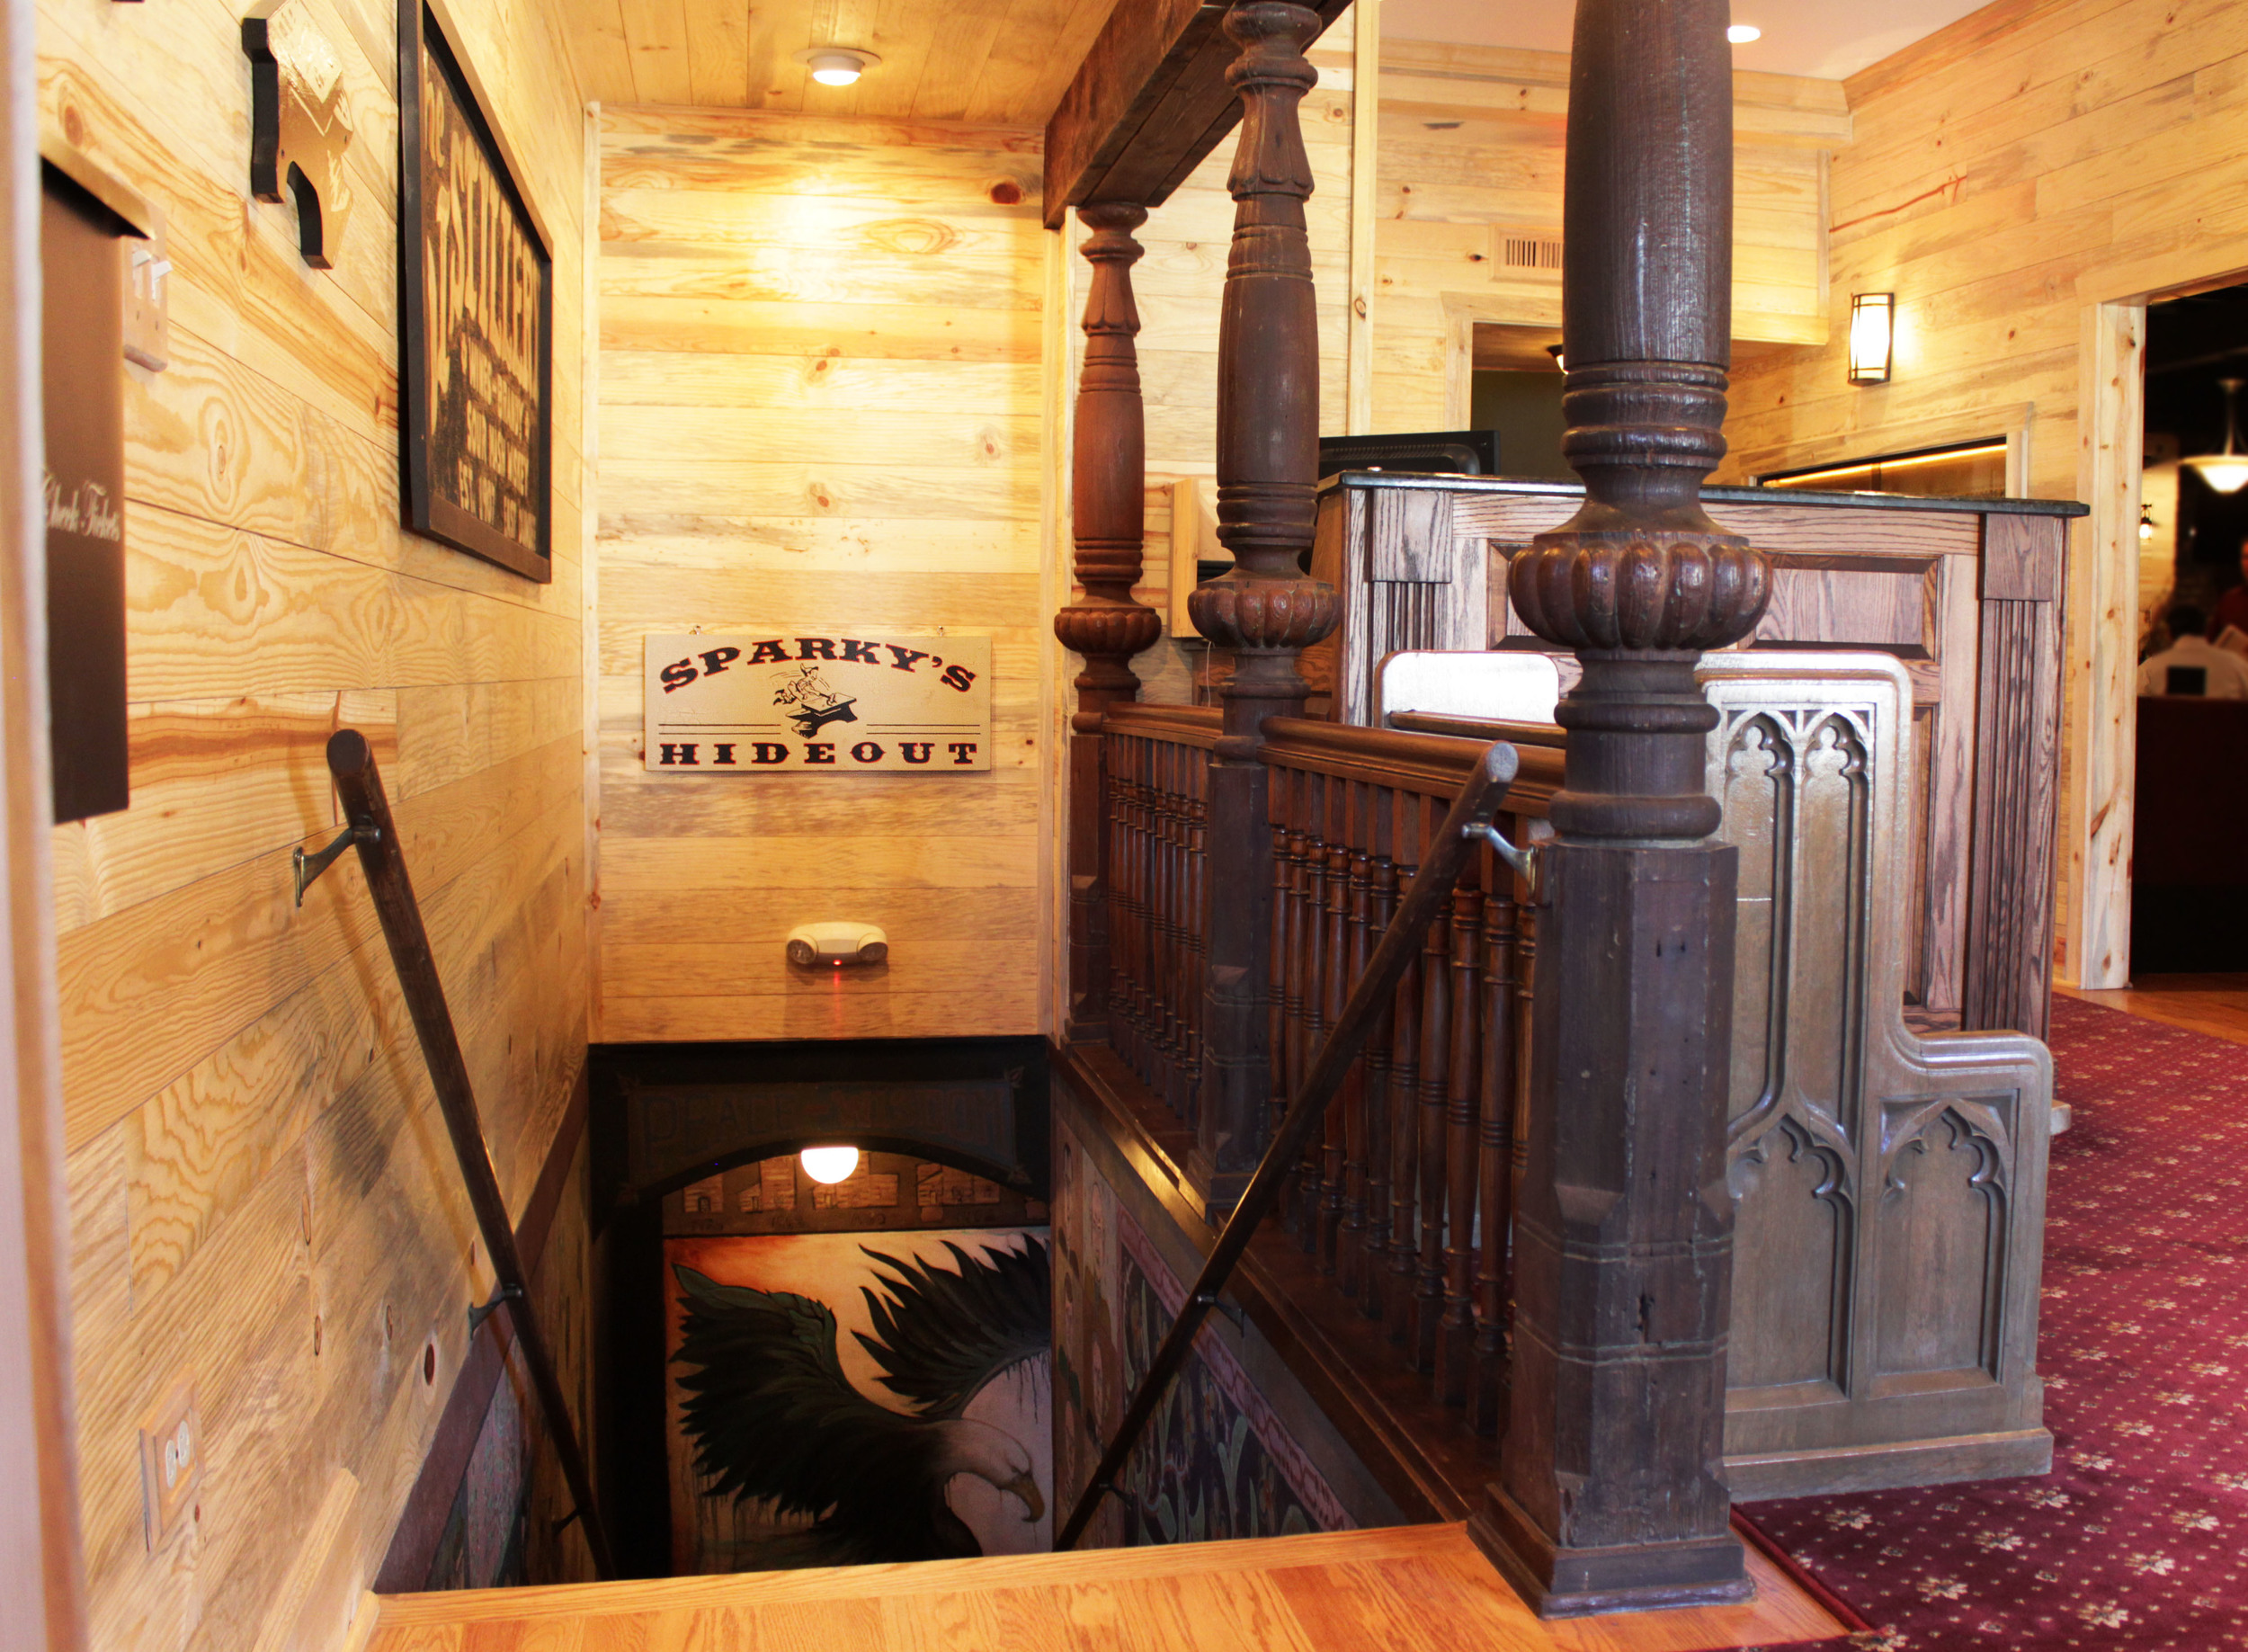 Entry way -Sparky's, Wine Lockers & Wine Cellar